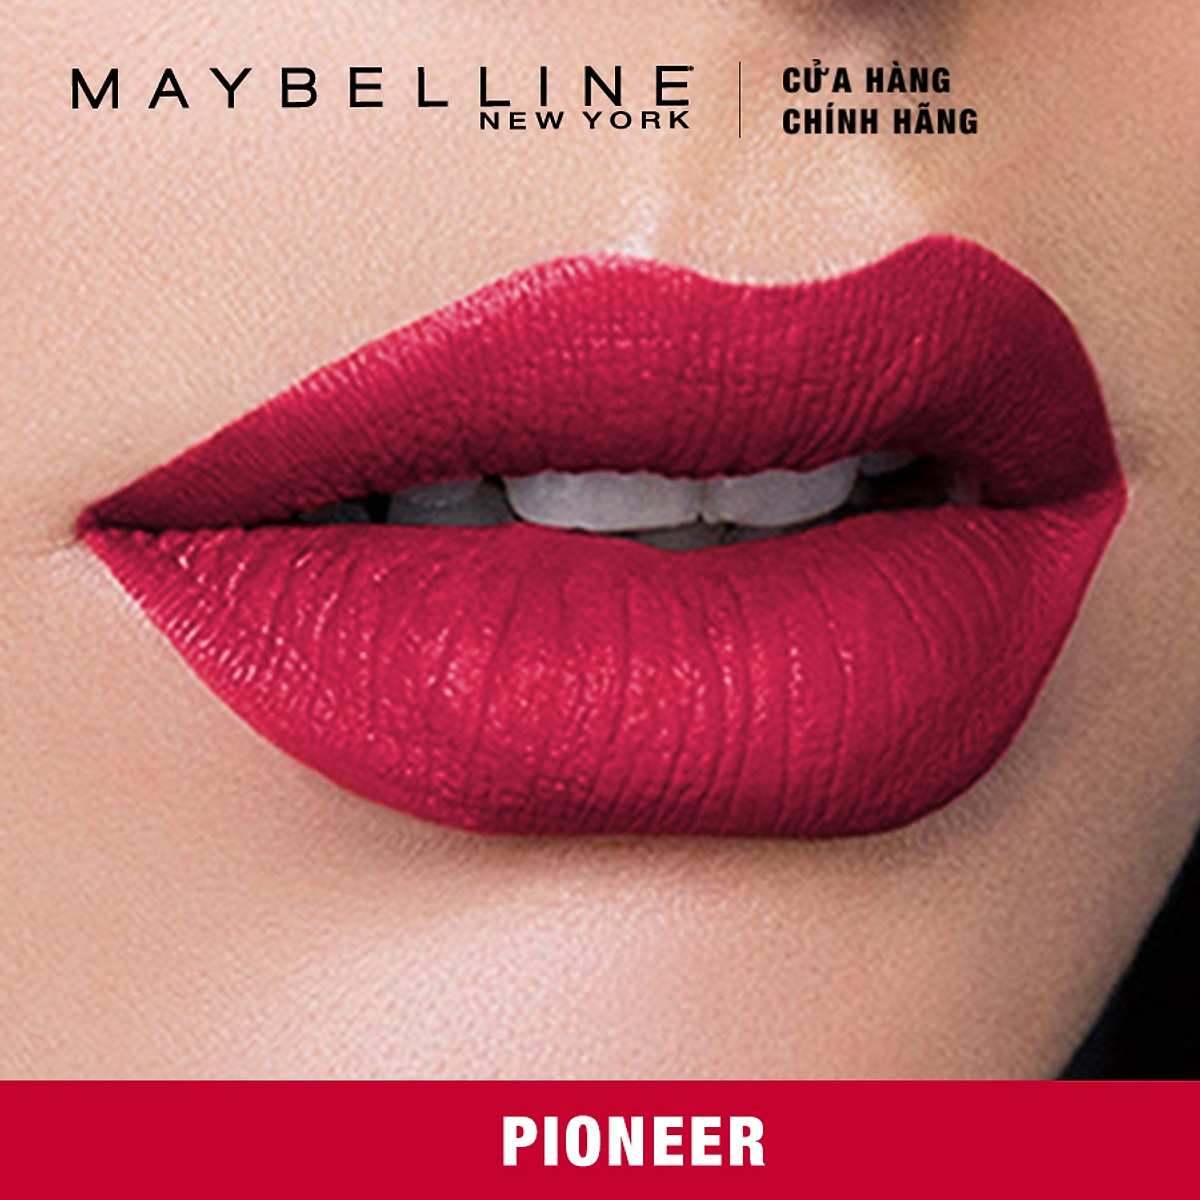 Son Kem Lì Maybelline Super Stay Matte Ink 5ml - Màu 20 Pioneer